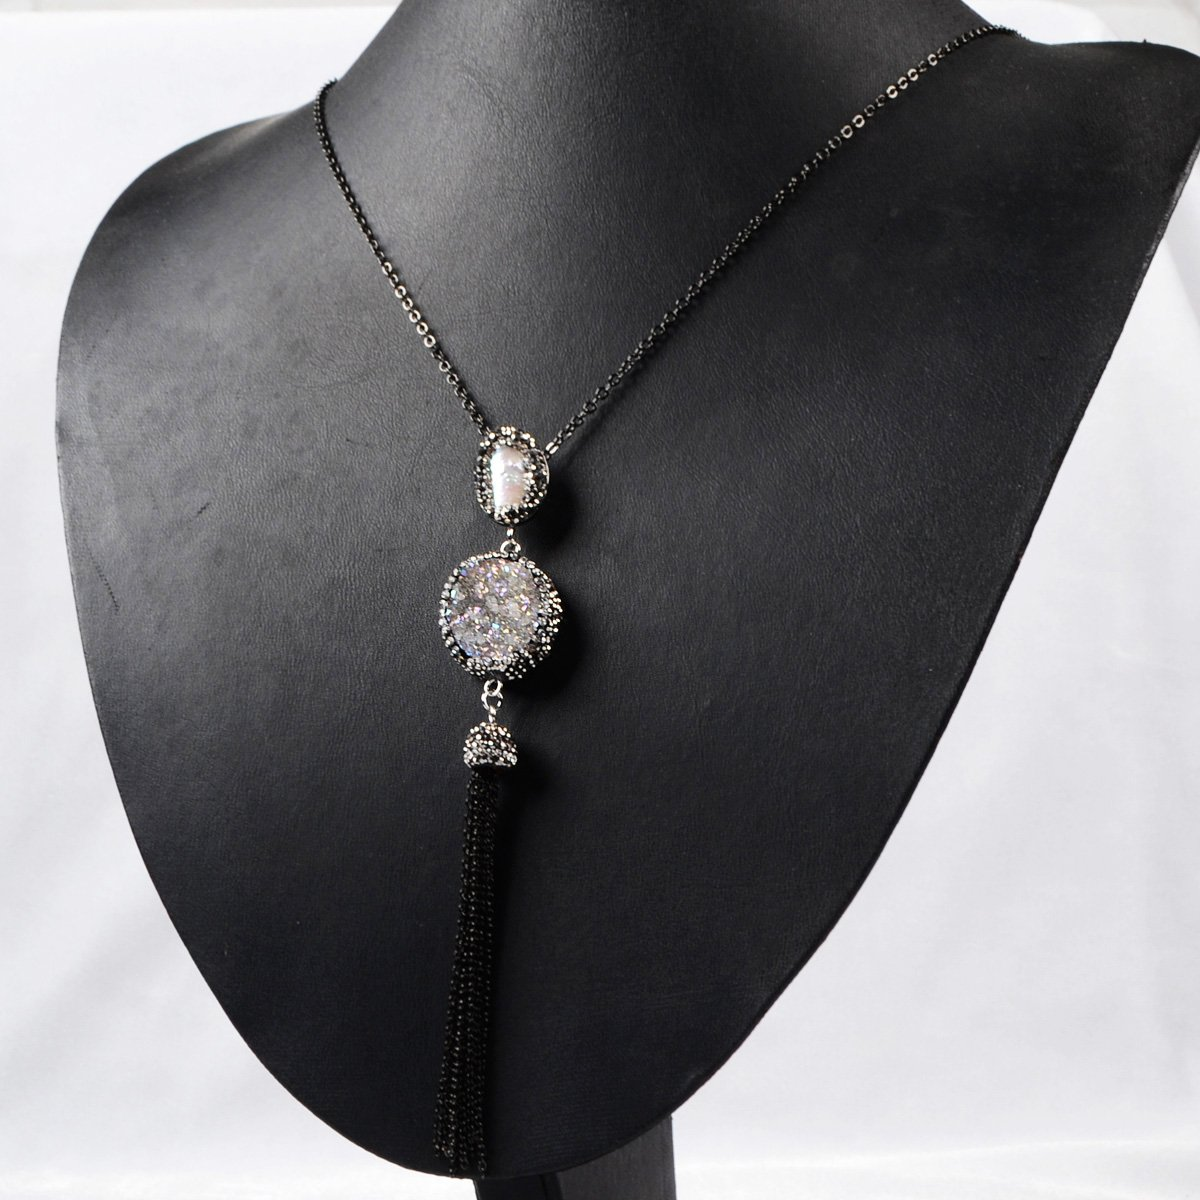 JAB Round Natural Agate Titanium AB Druzy /& Natural Pearl Tassel Necklace Paved Zircon Black Chain